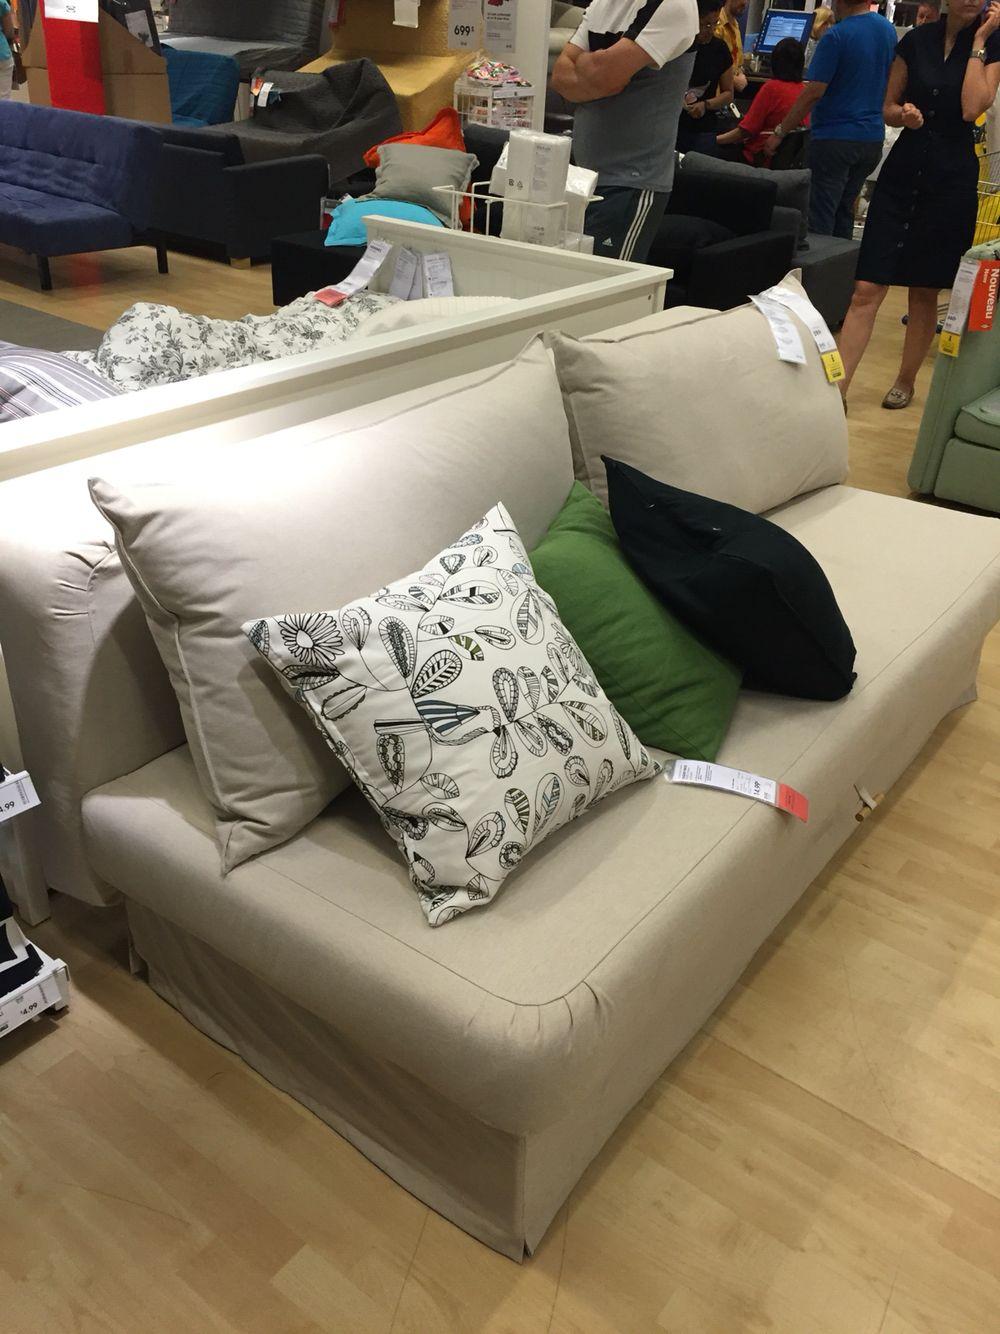 Himmene 599 Ikea 603 007 17 Bedroom Design Furniture Creative